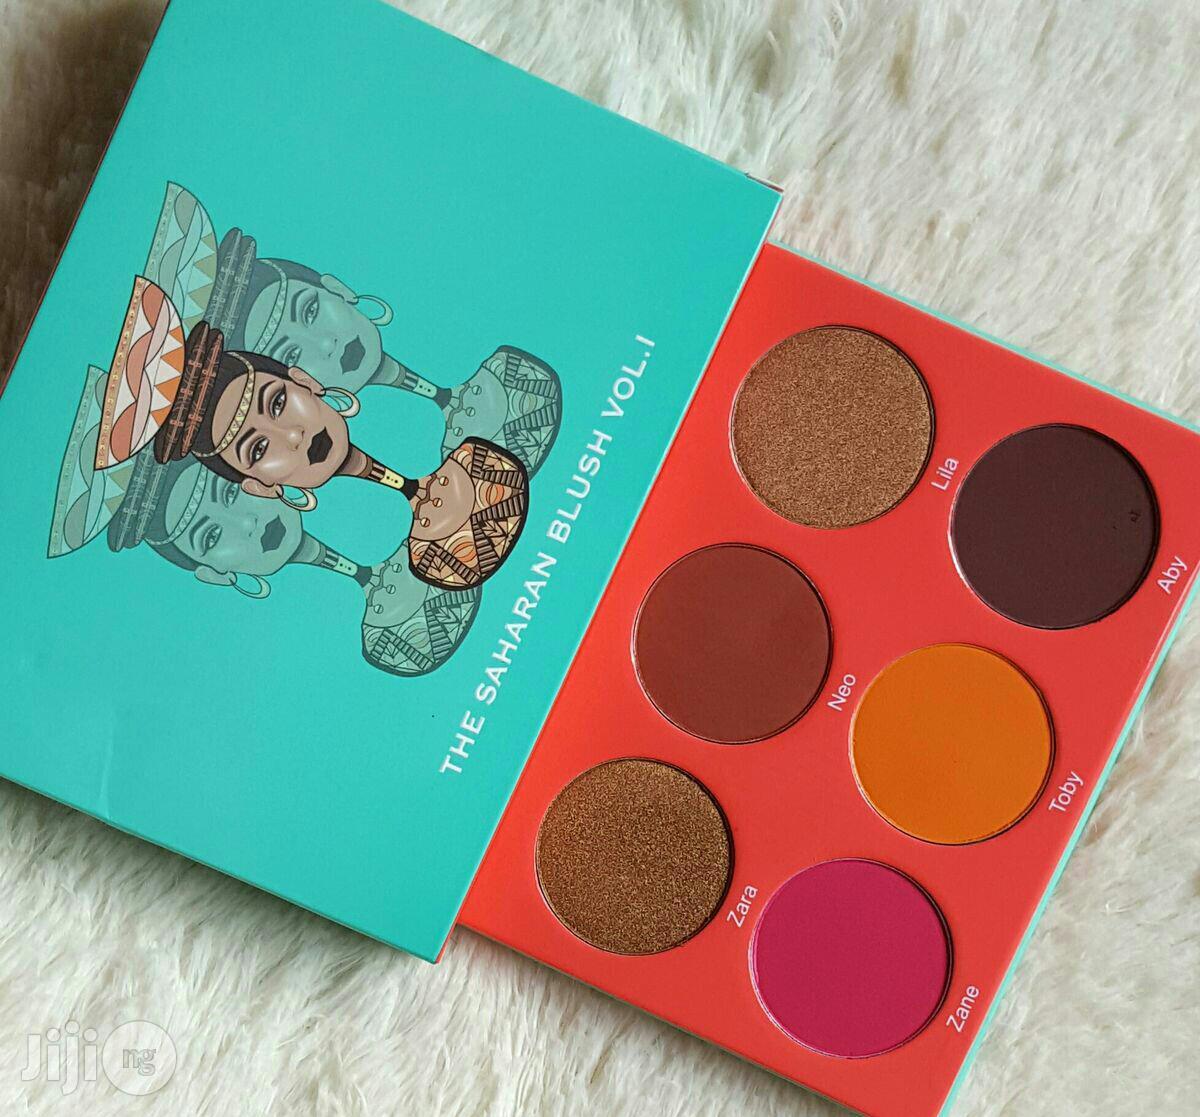 Archive: Saharan Blush Palette Vol 1 by Juvia's Place